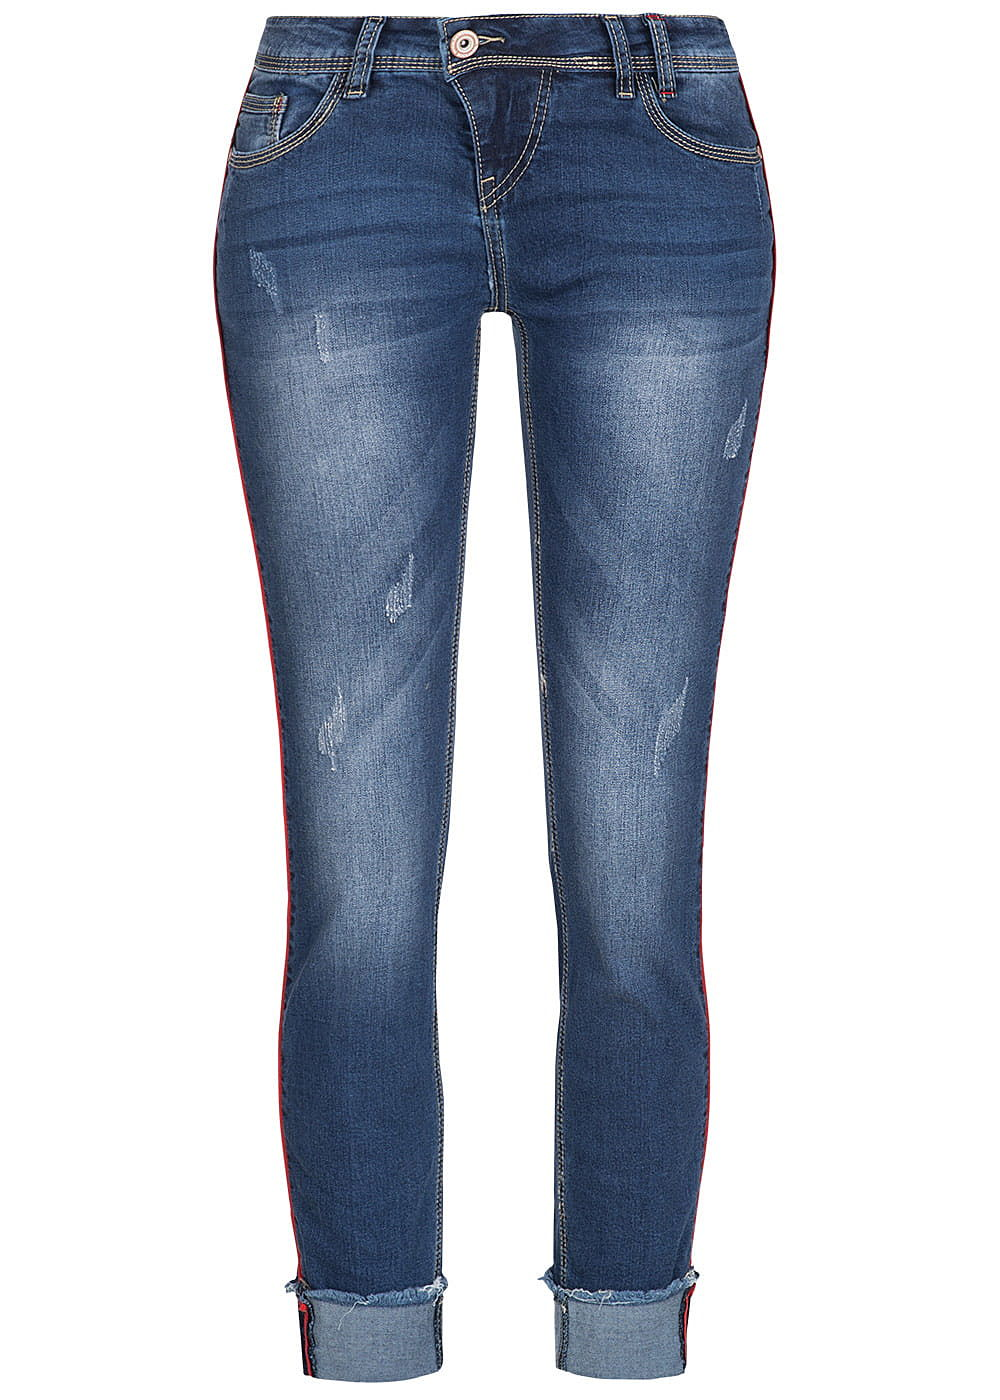 d2fad4d88ef2 Eight2Nine Damen Jeans Hose Crash Optik 5-Pockets by Rock Angel medium blau  denim